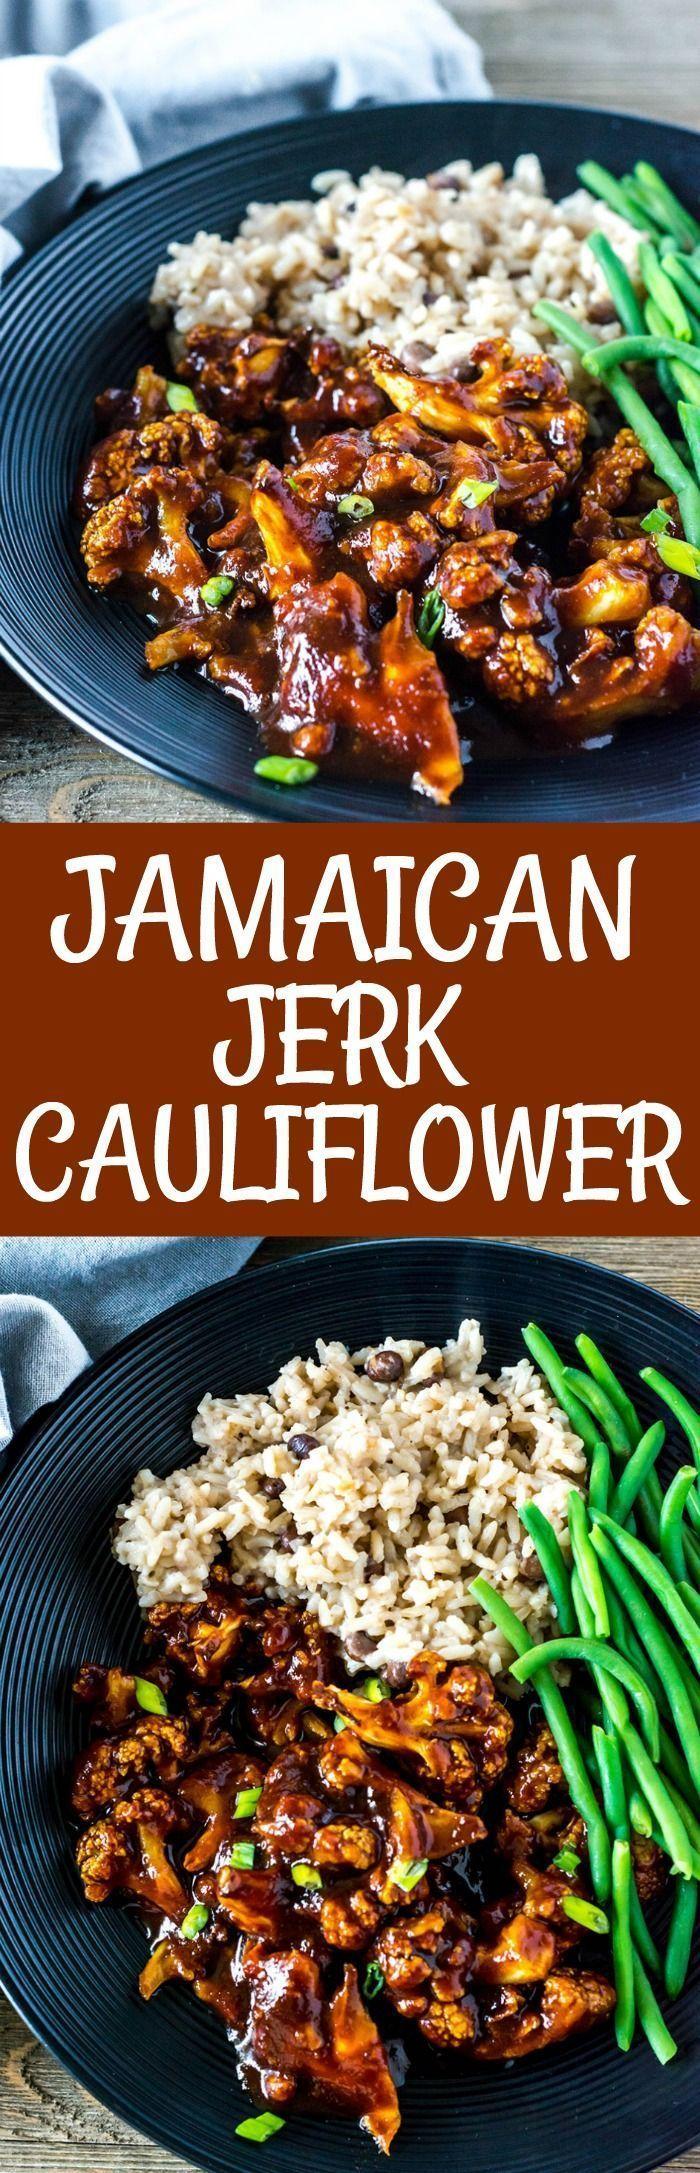 Jamaican Jerk Cauliflower vegan, gluten-free #jamaican #jamaicanroots